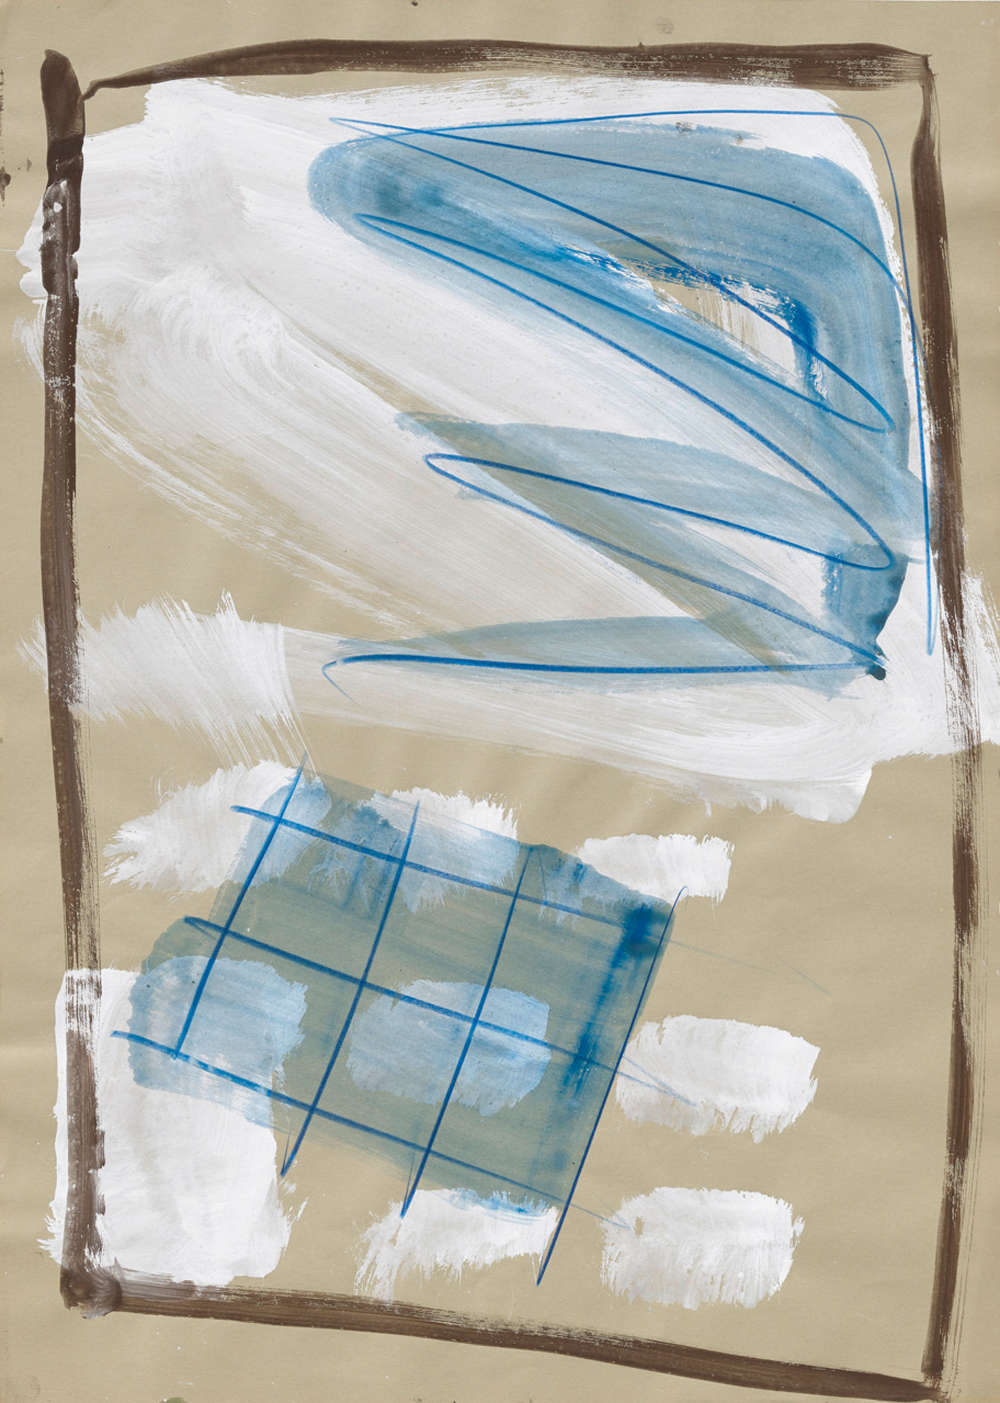 Markus Lüpertz, Untitled, 1977 - 1978. Gouache, crayon on paper 27 1/4 x 19 1/2 inches 69.5 x 49.5 cm